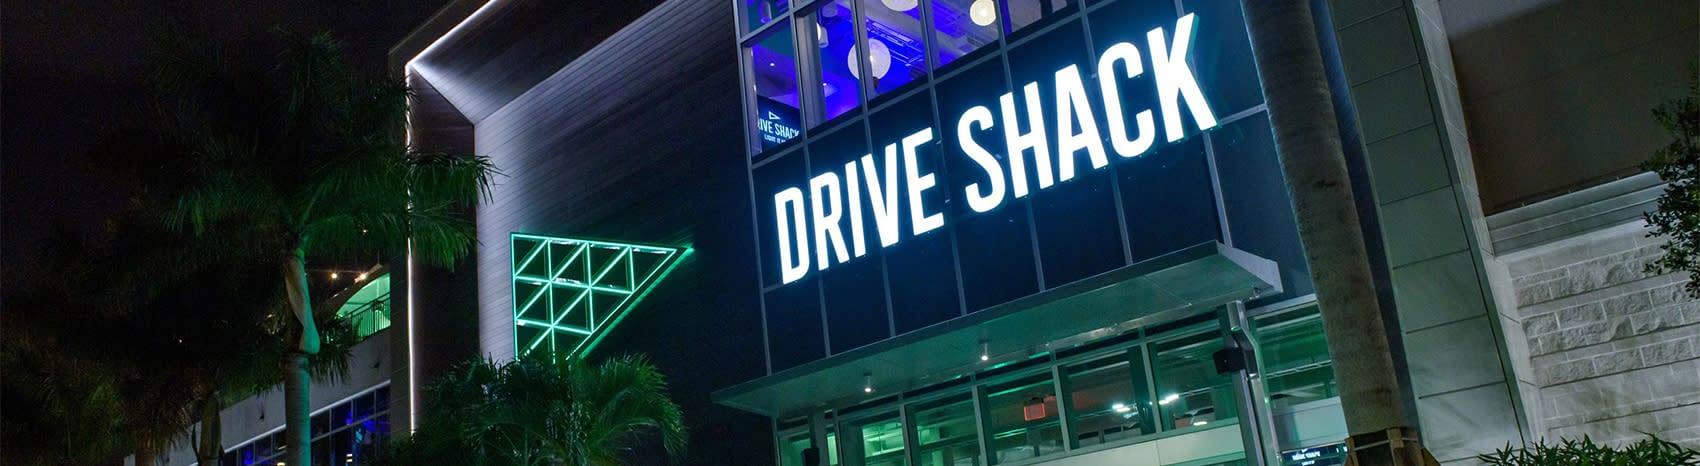 Drive Shack West Palm Beach Location